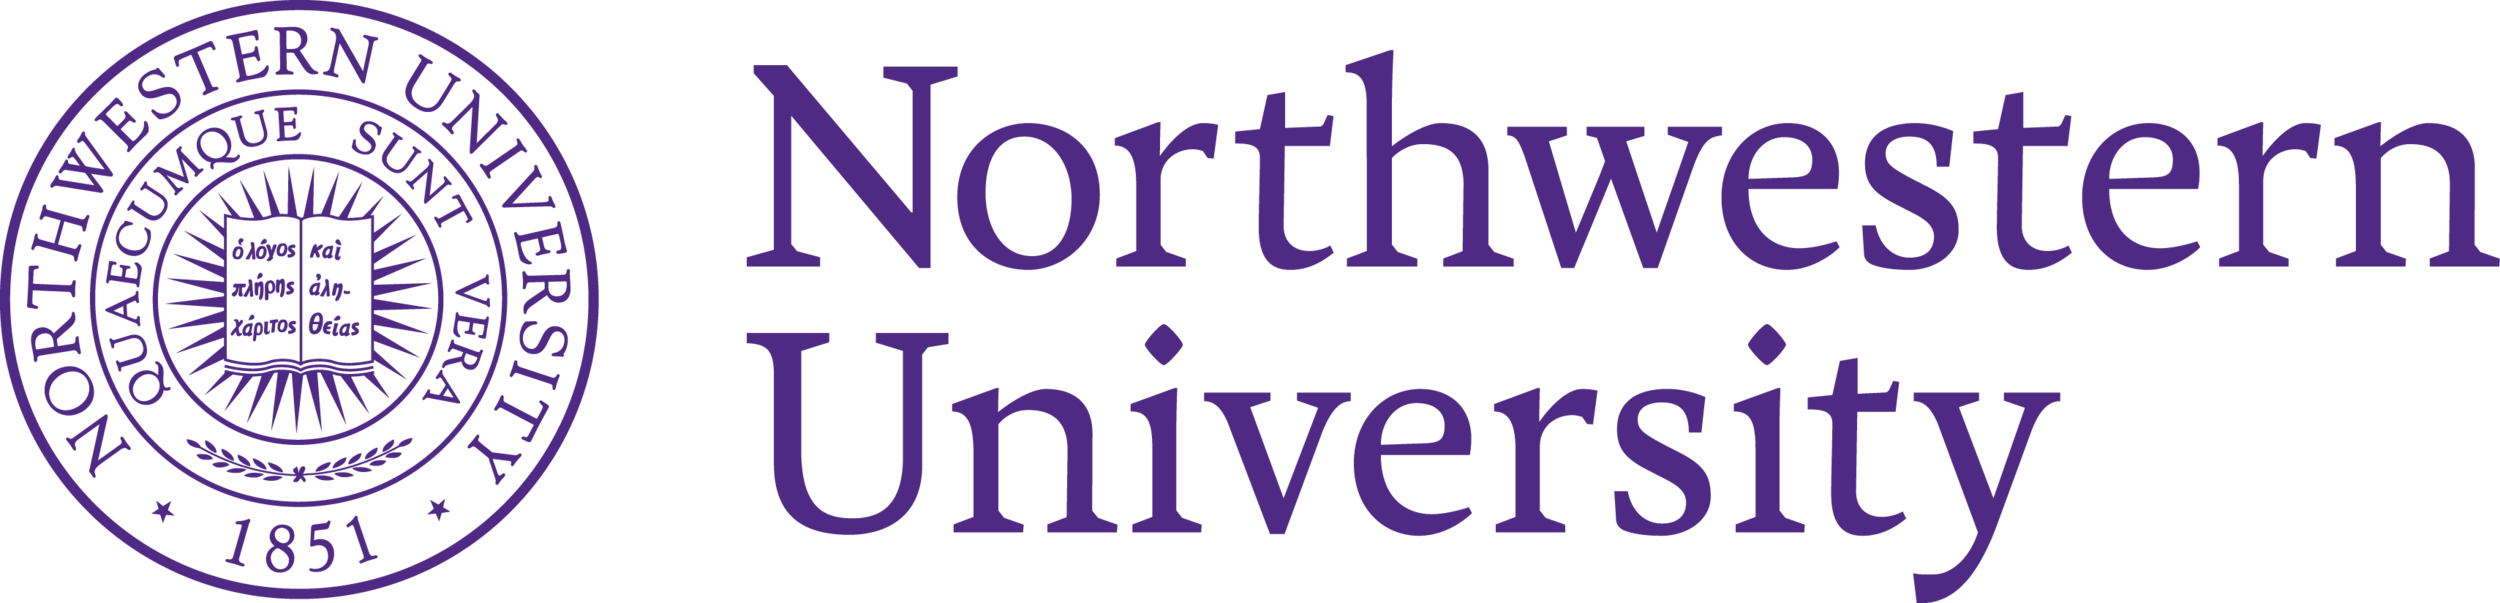 northwesternuniversitypng